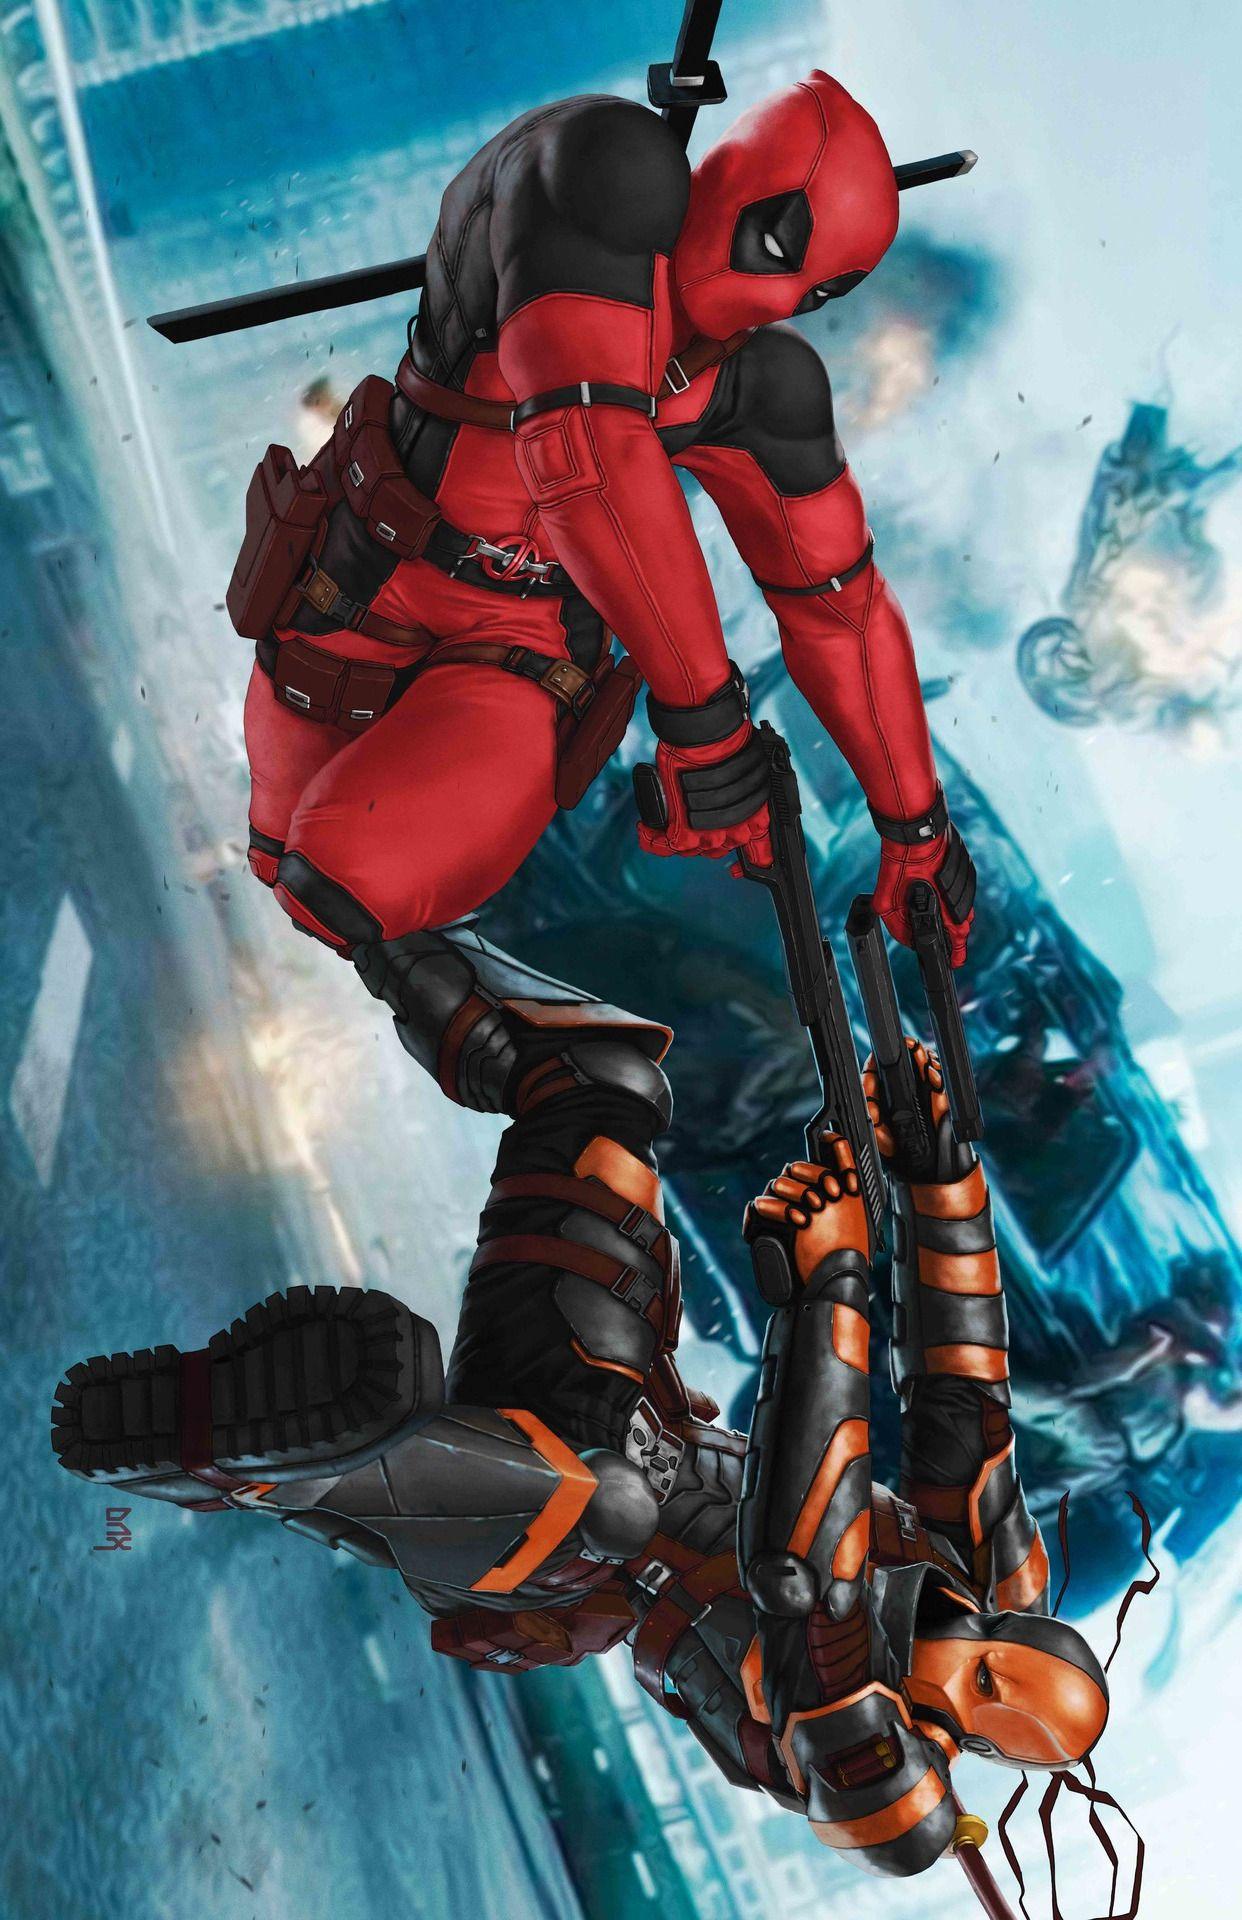 Deathstroke Vs Deadpool Arthur Dacayo Deadpool Comic Deadpool Comic Book Marvel Superheroes